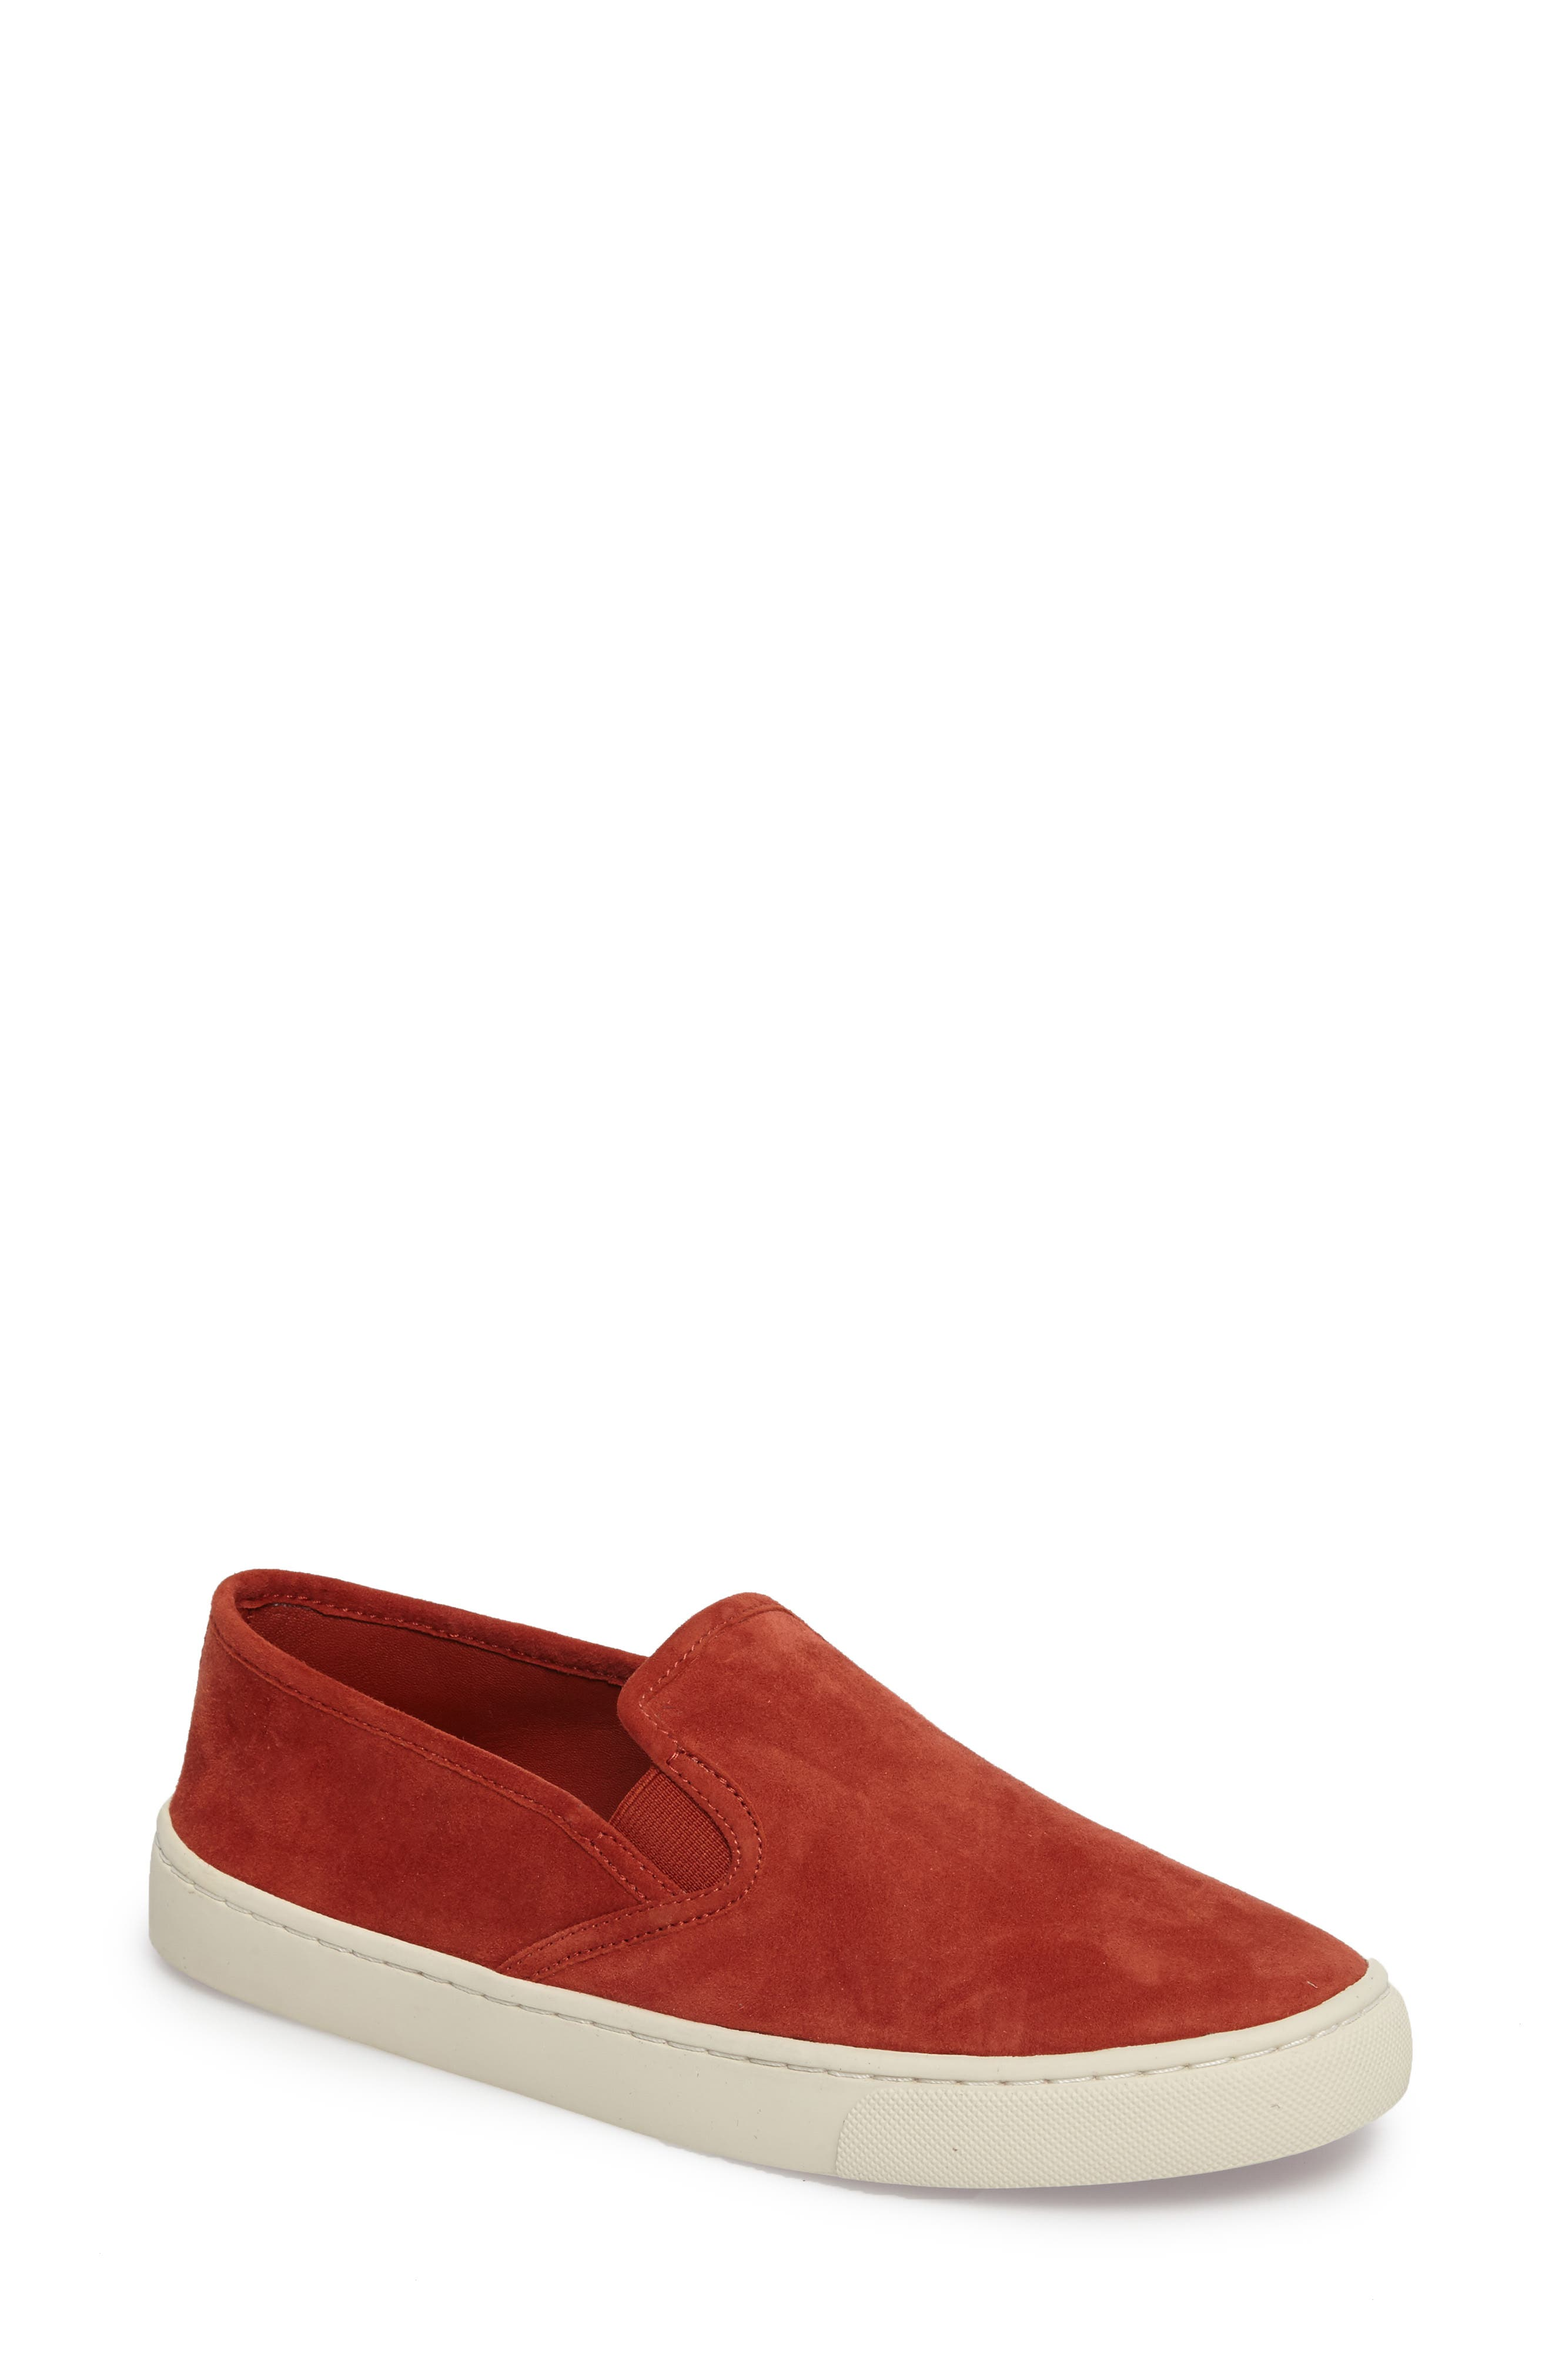 Alternate Image 1 Selected - Tory Burch Max Slip-On Sneaker (Women)